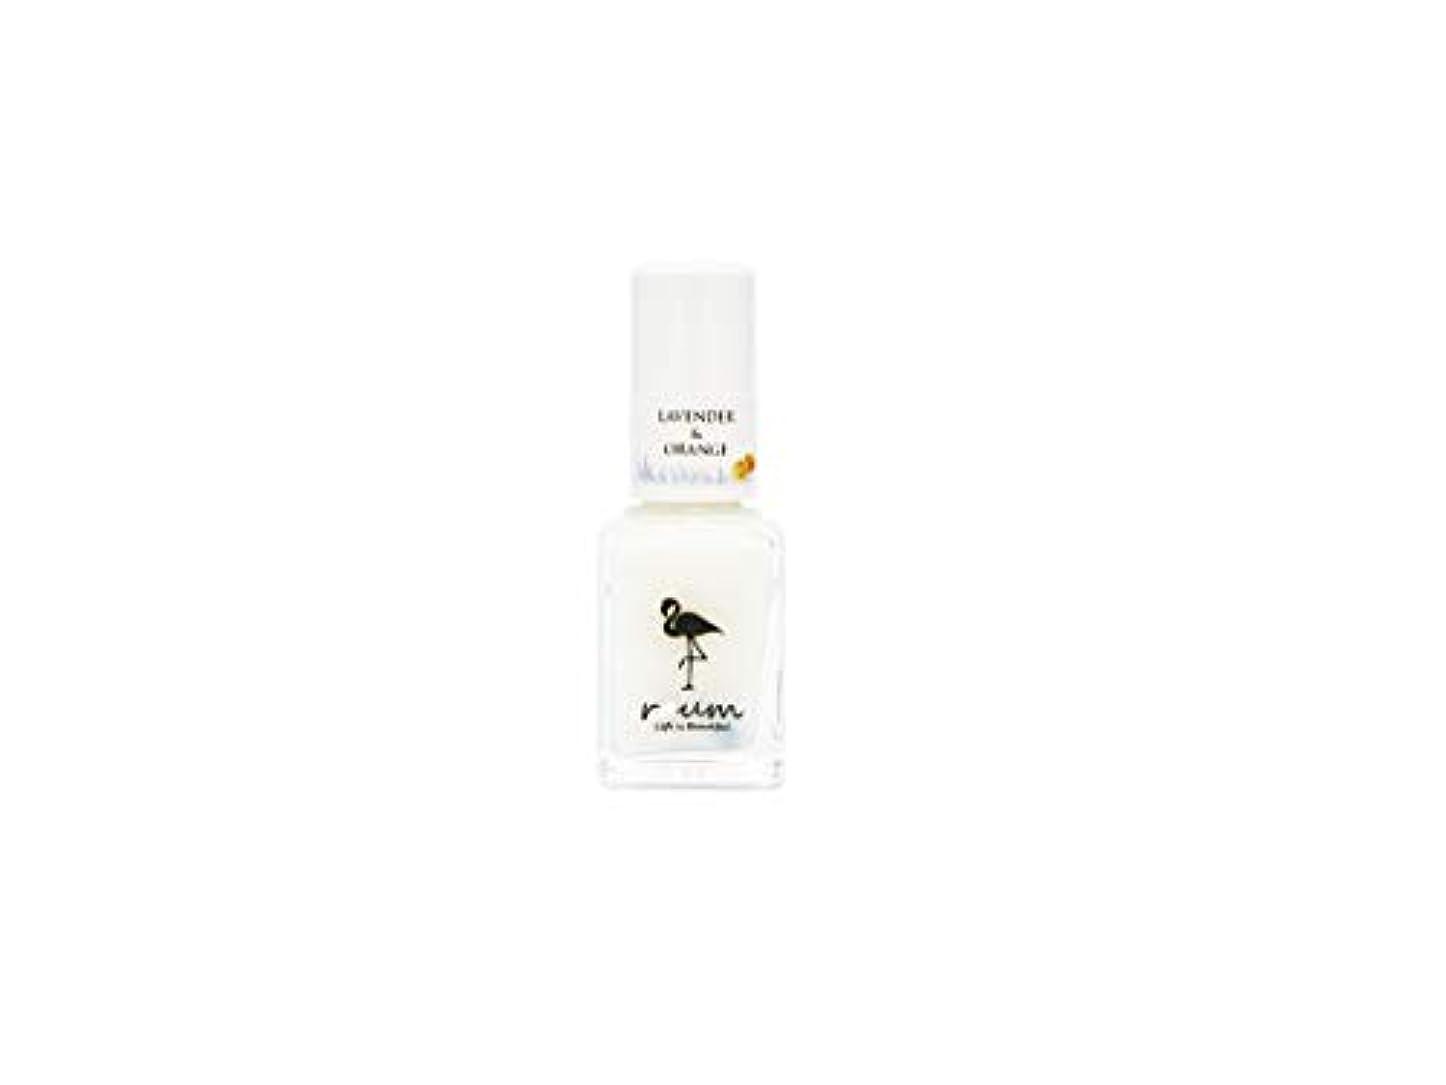 raum WATER CARE-NAIL WN-0026 ベース&トップコート ラベンダー&オレンジの香り(精油入り)